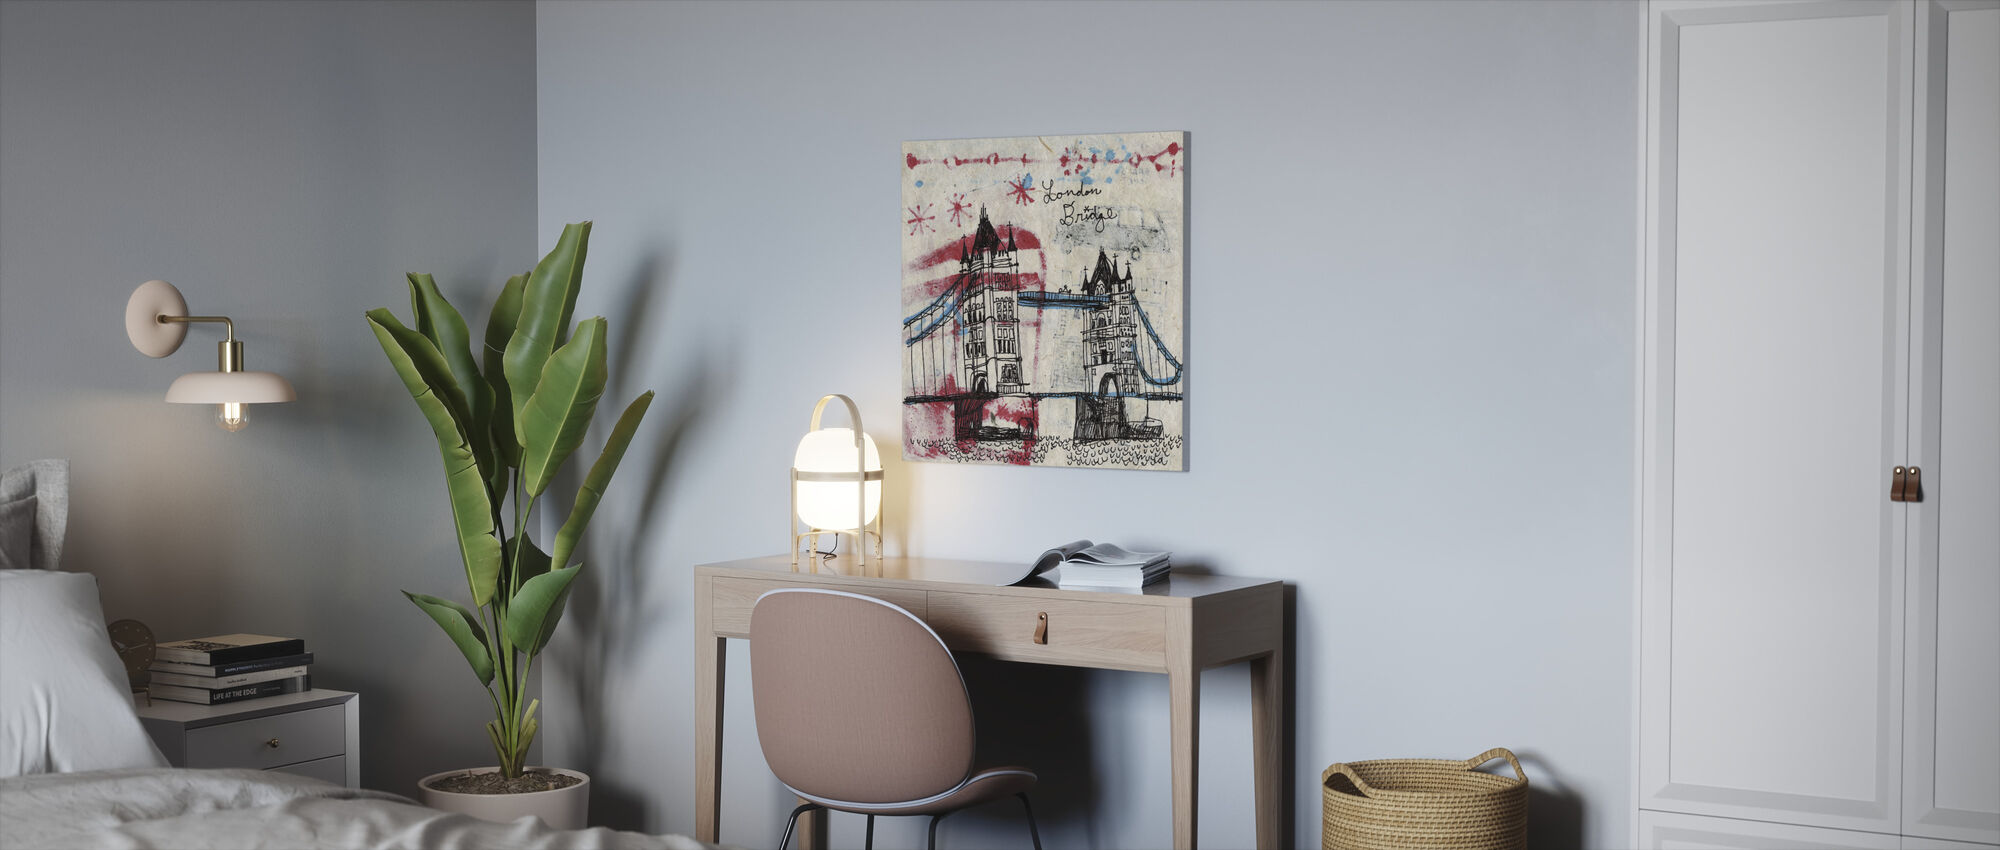 Tårn bro - Lerretsbilde - Kontor